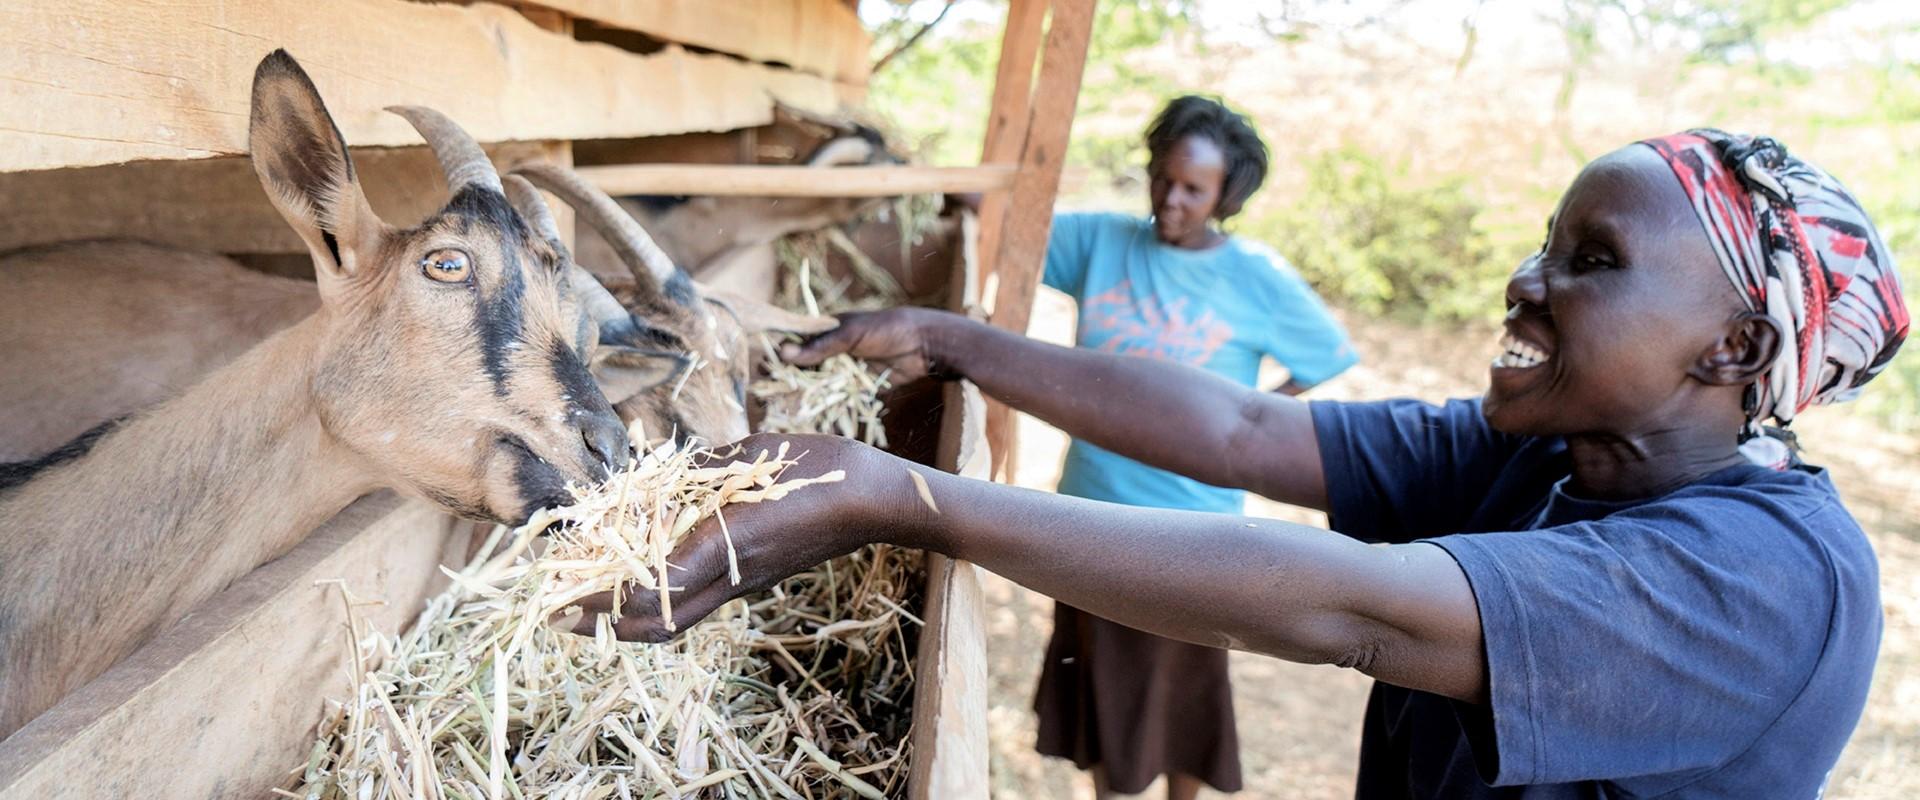 progetto maziwa kenya mani tese 2021